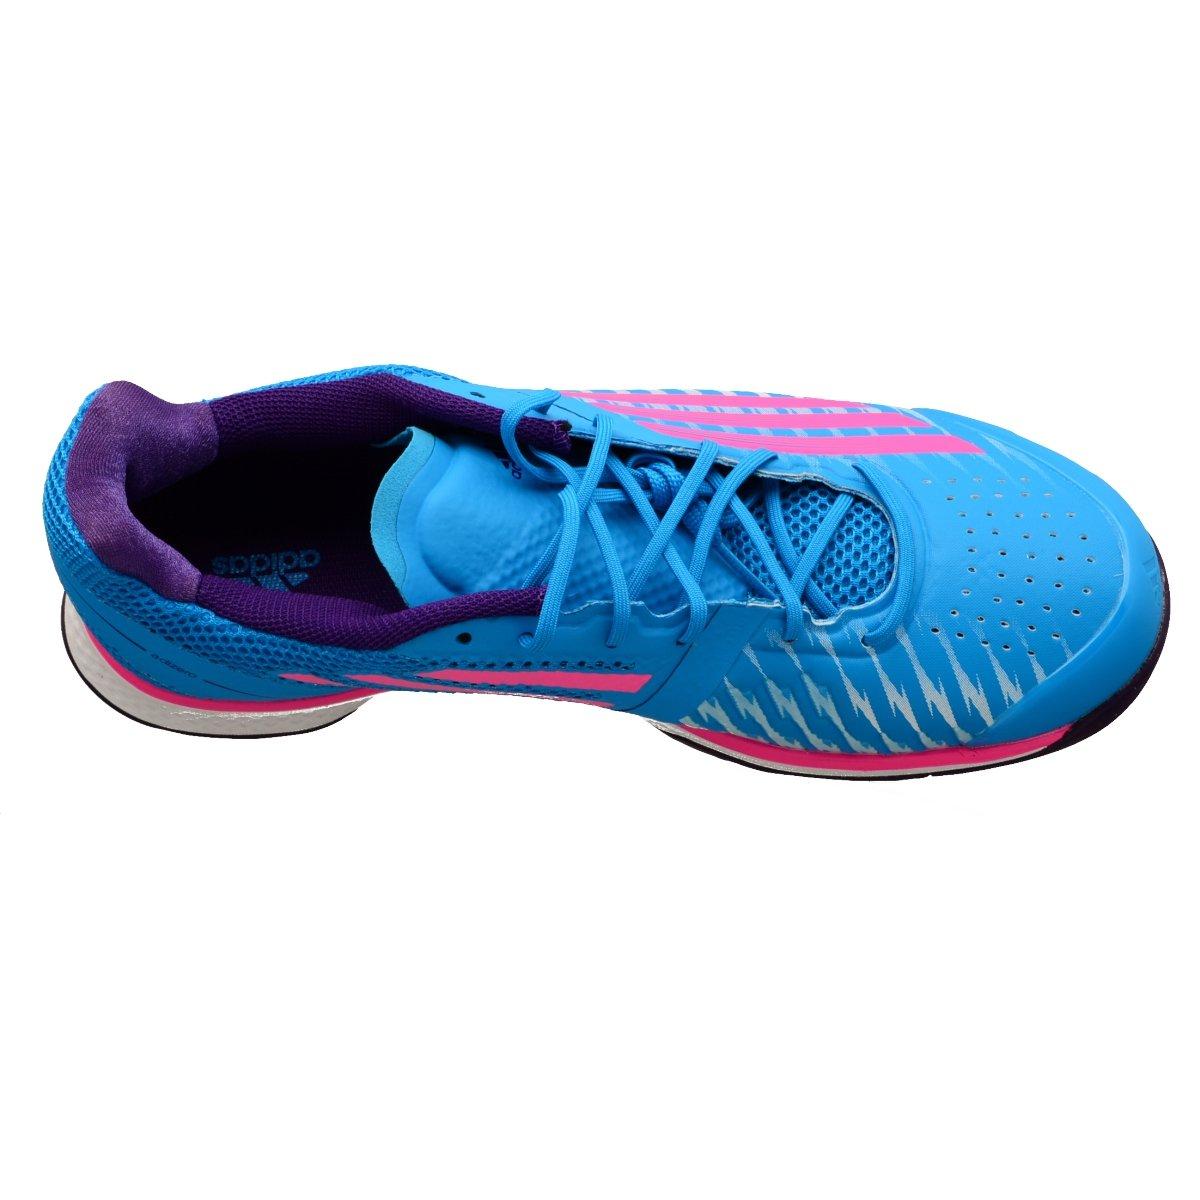 Adidas Performance Performance Performance Adizero Counterblast 7 M19908, Scarpe sportive efb058